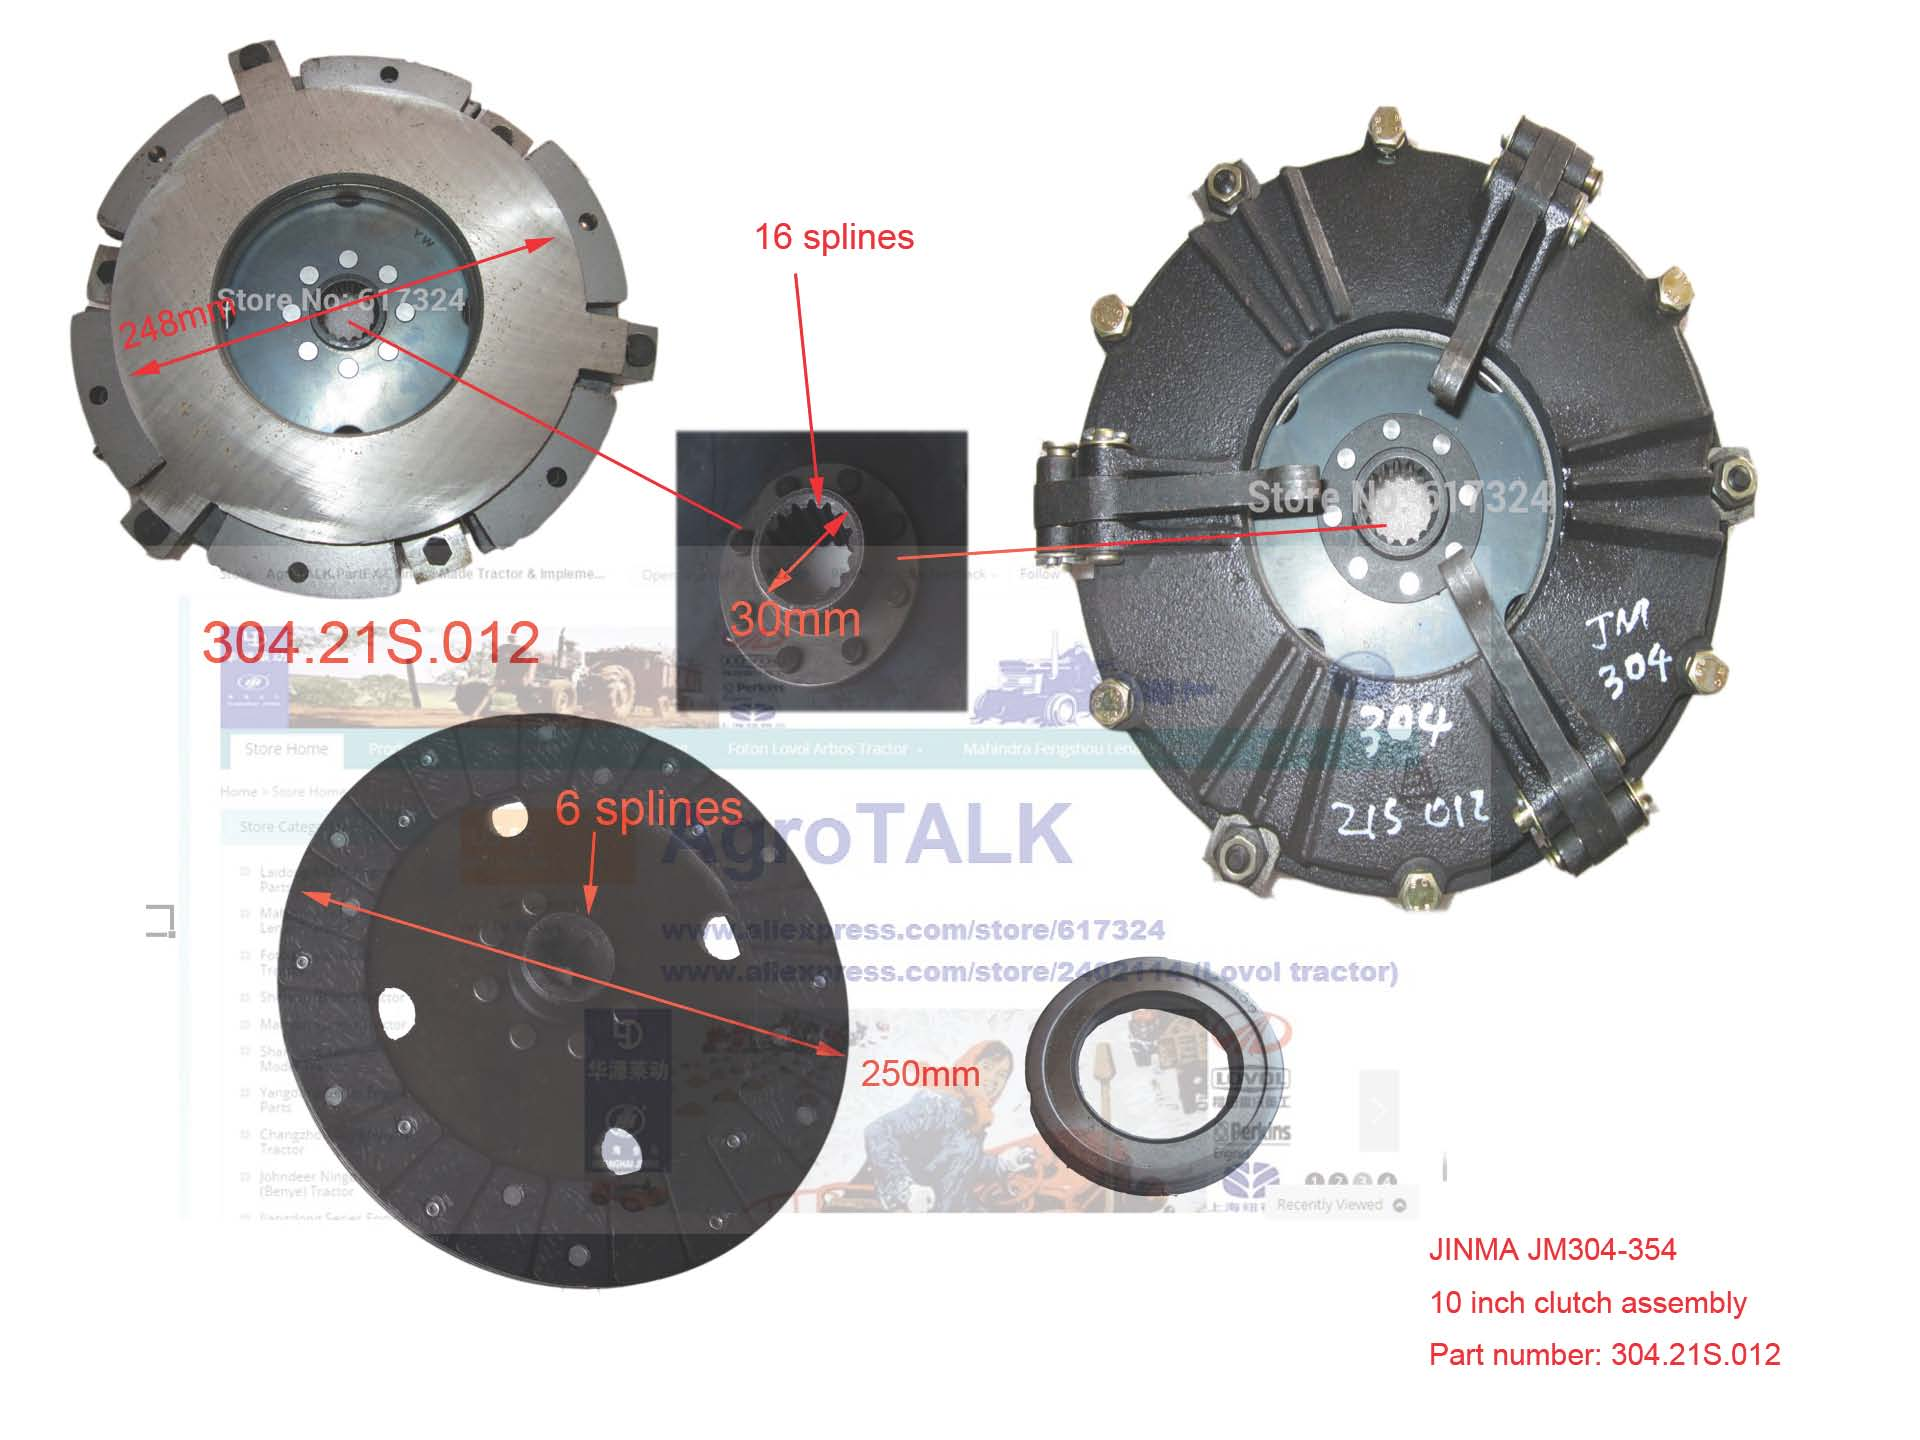 Embrague de dos etapas de 10 pulgadas con disco PTO y cojinete de liberación para tractor JINMA 304, número 304,21 S. 012